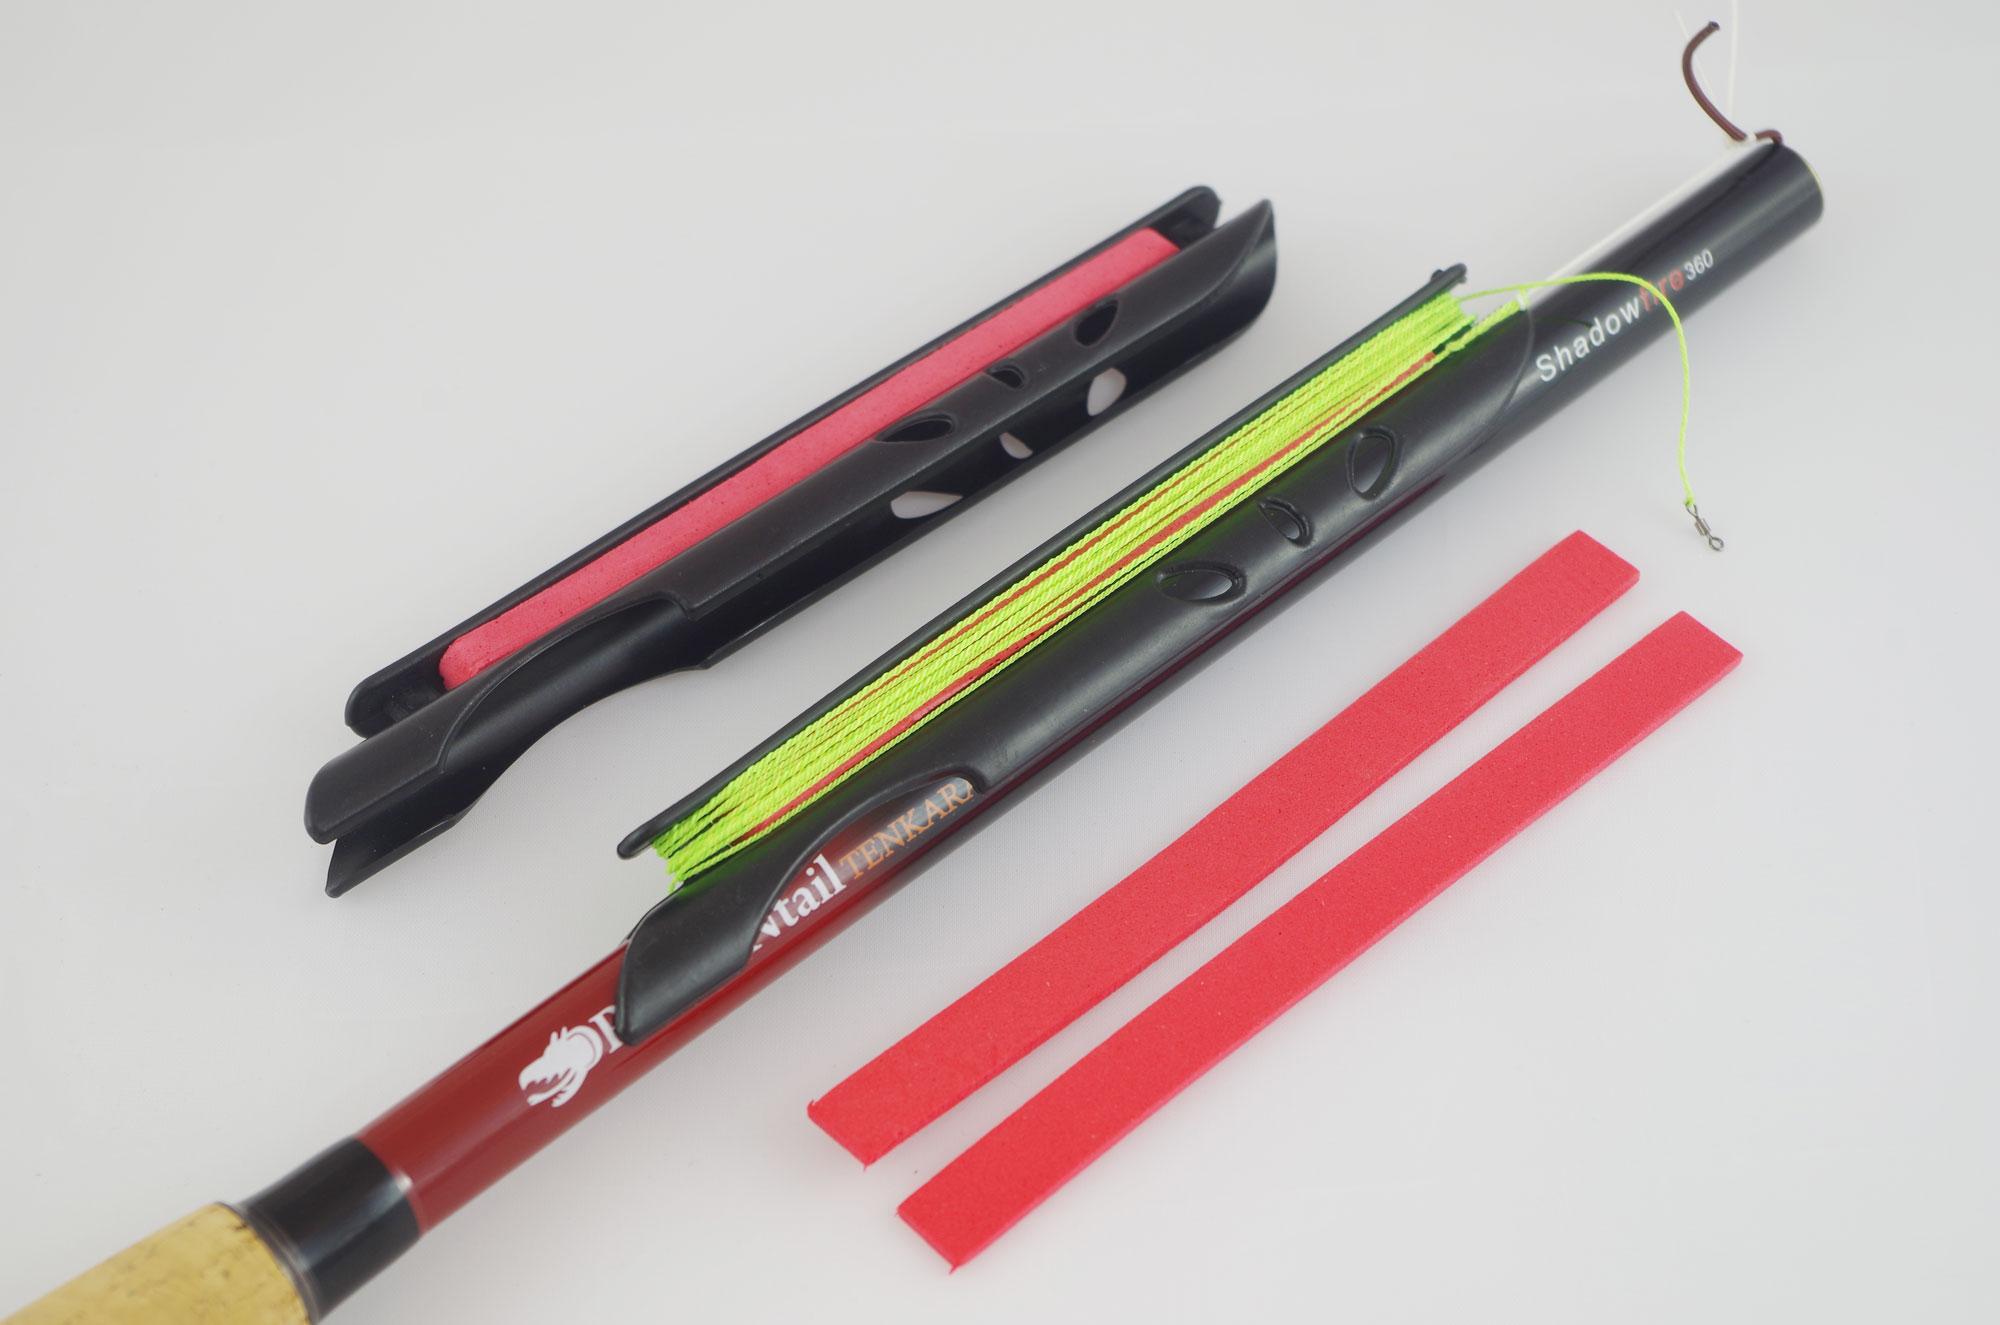 Tenkara Angler Gift Guide - Tenkara Line Winder